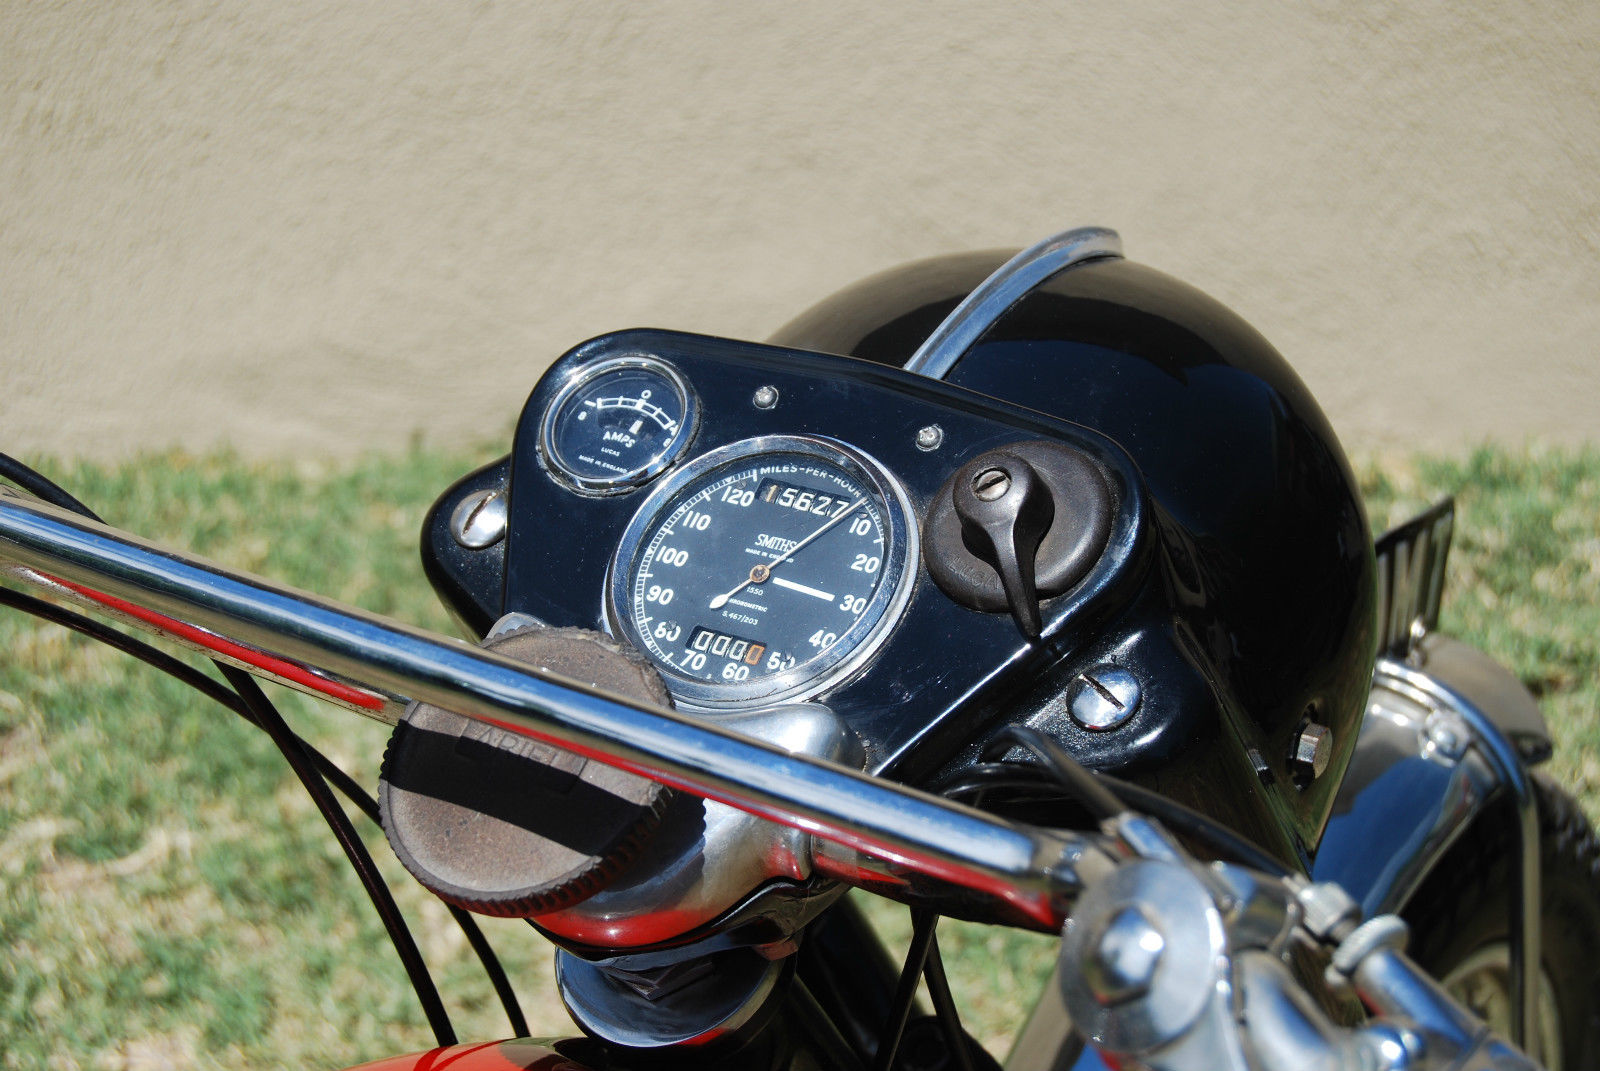 Ariel HS - 1957 - Ammeter, Speedo, Ignition, Steering Damper and Headlight.